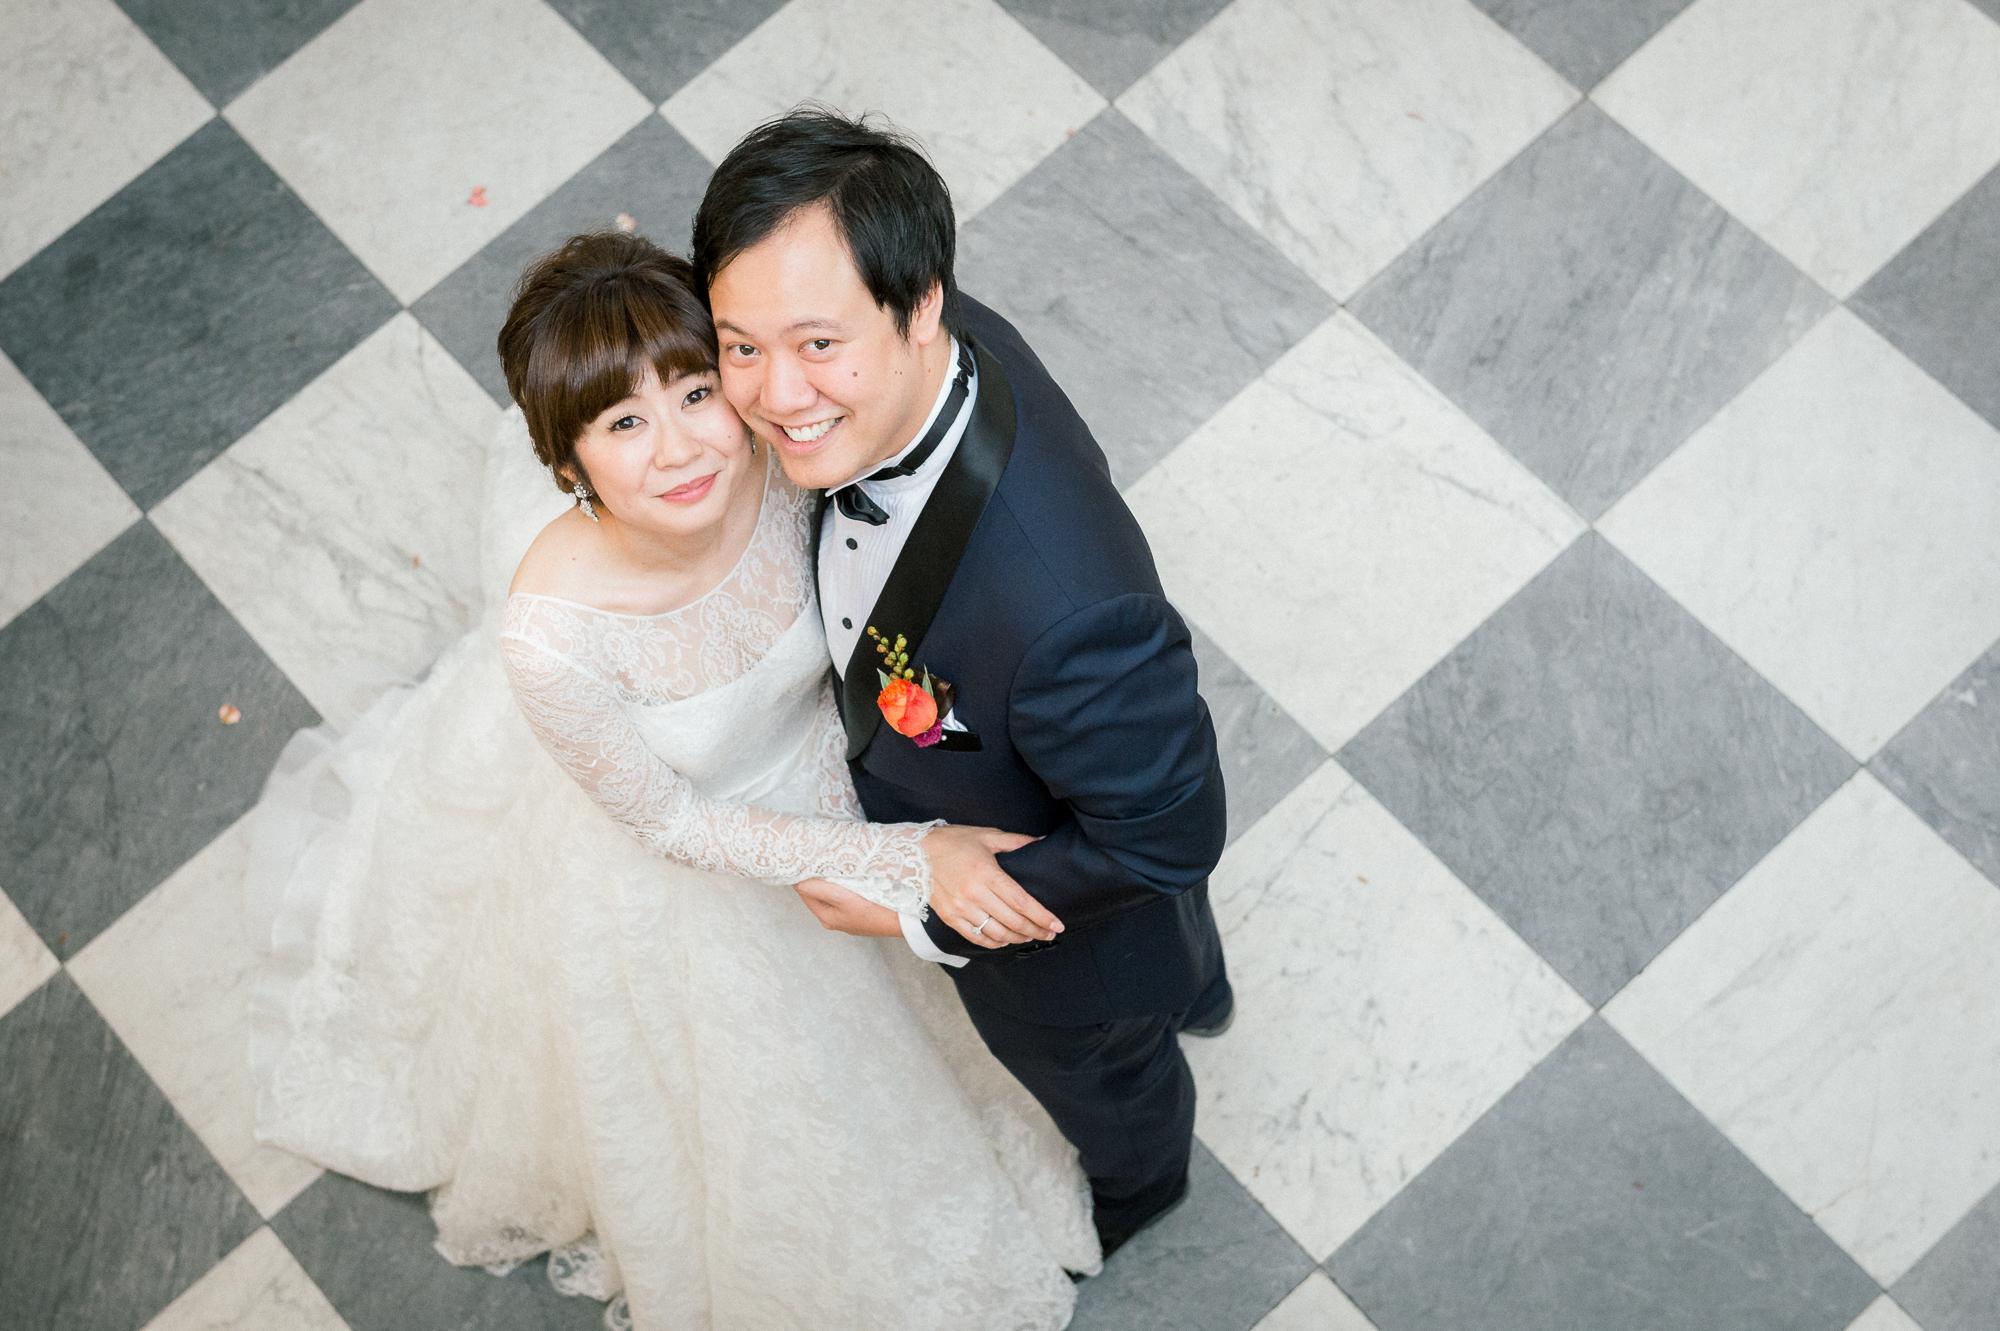 London wedding photographer-Erika Rimkute Photography-123.jpg